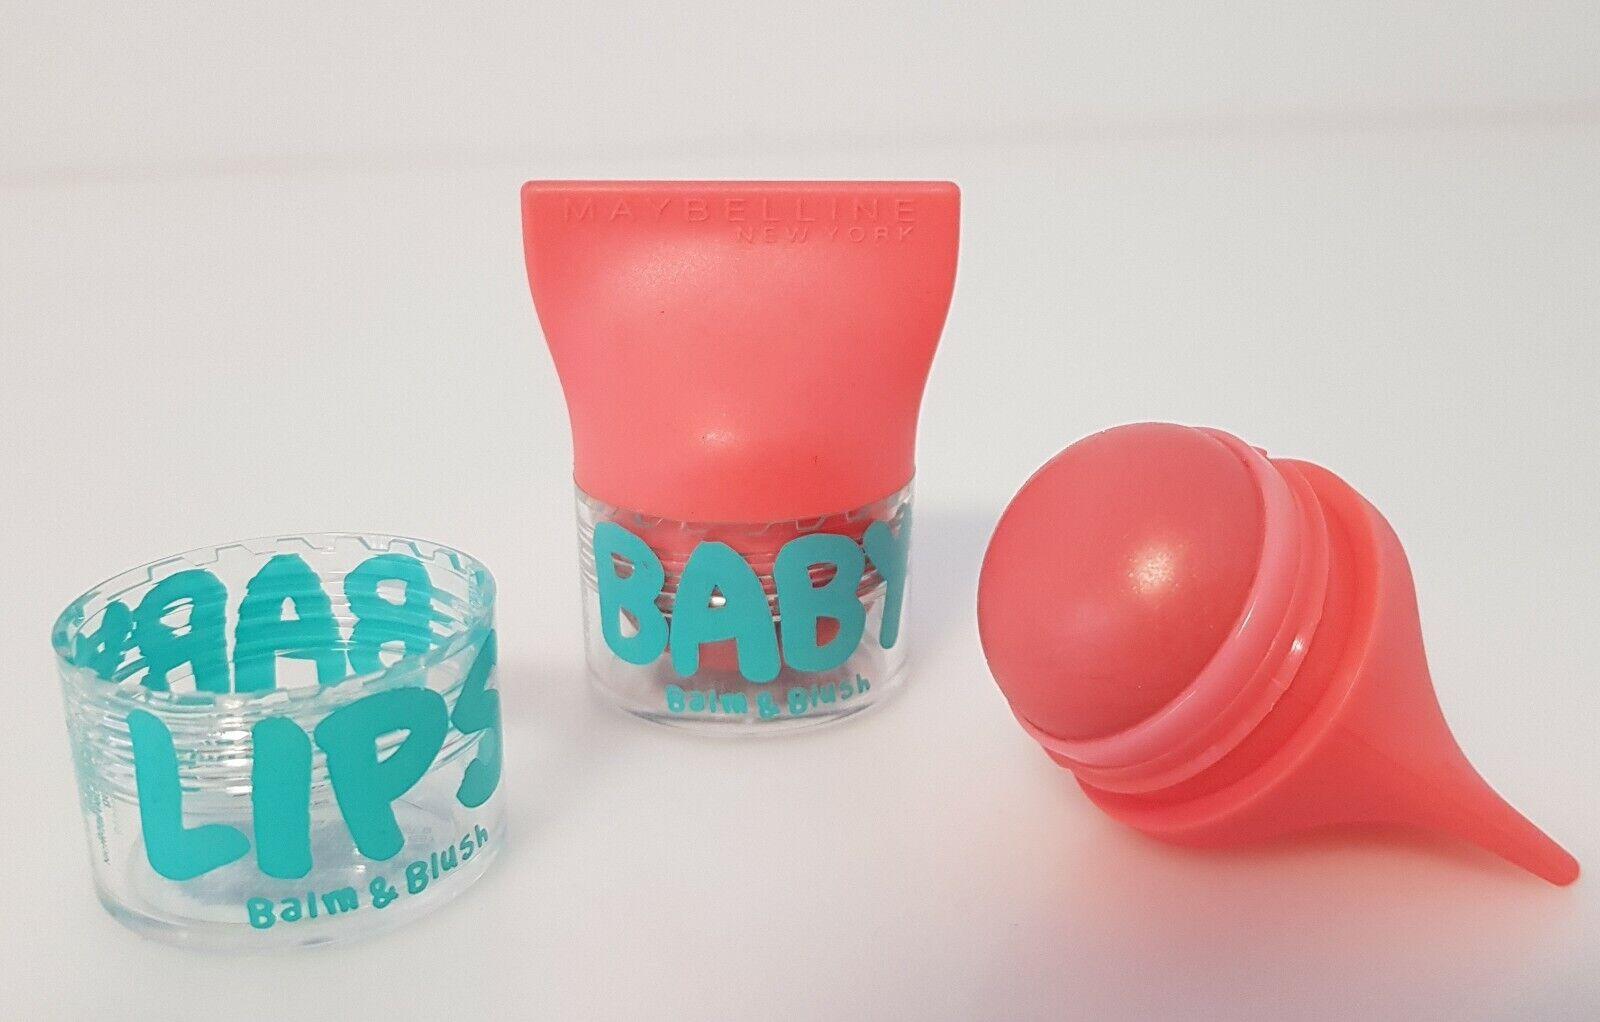 Maybelline Baby Lips Balm & Rush Lippenbalsam Lippenpflege 01 Innocent Peach